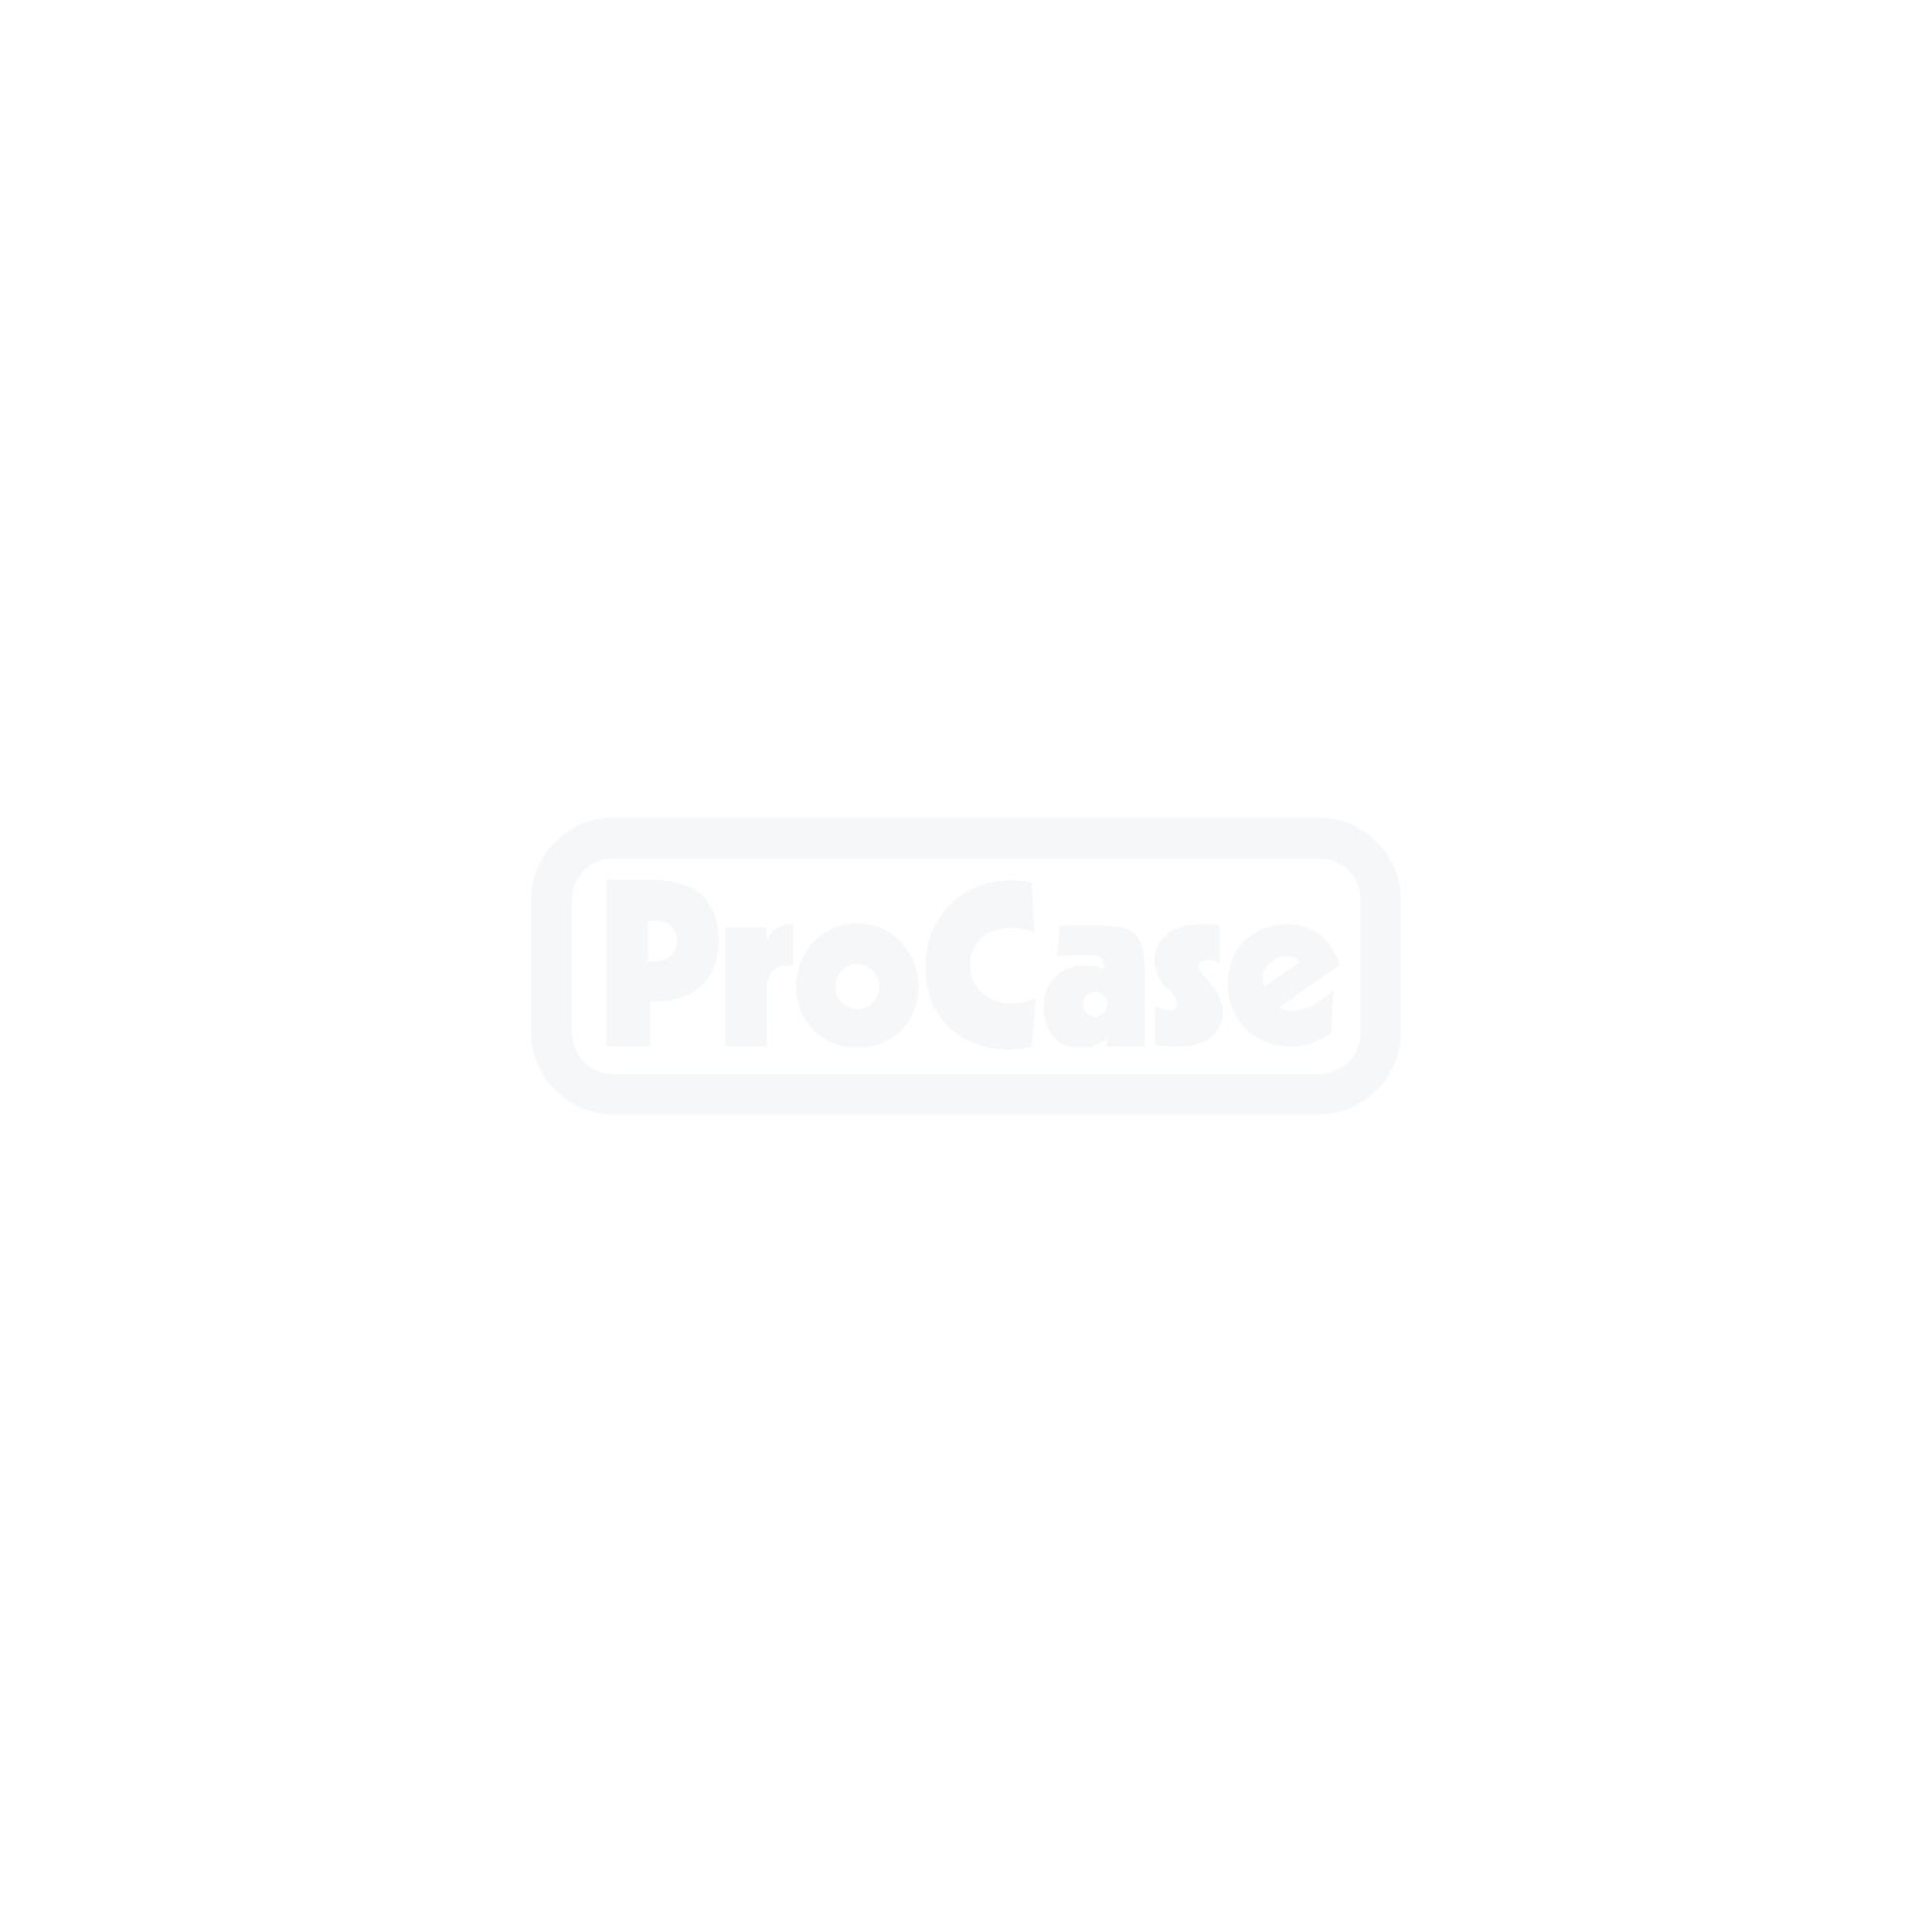 Flightcase für Panasonic TX-26LX70F